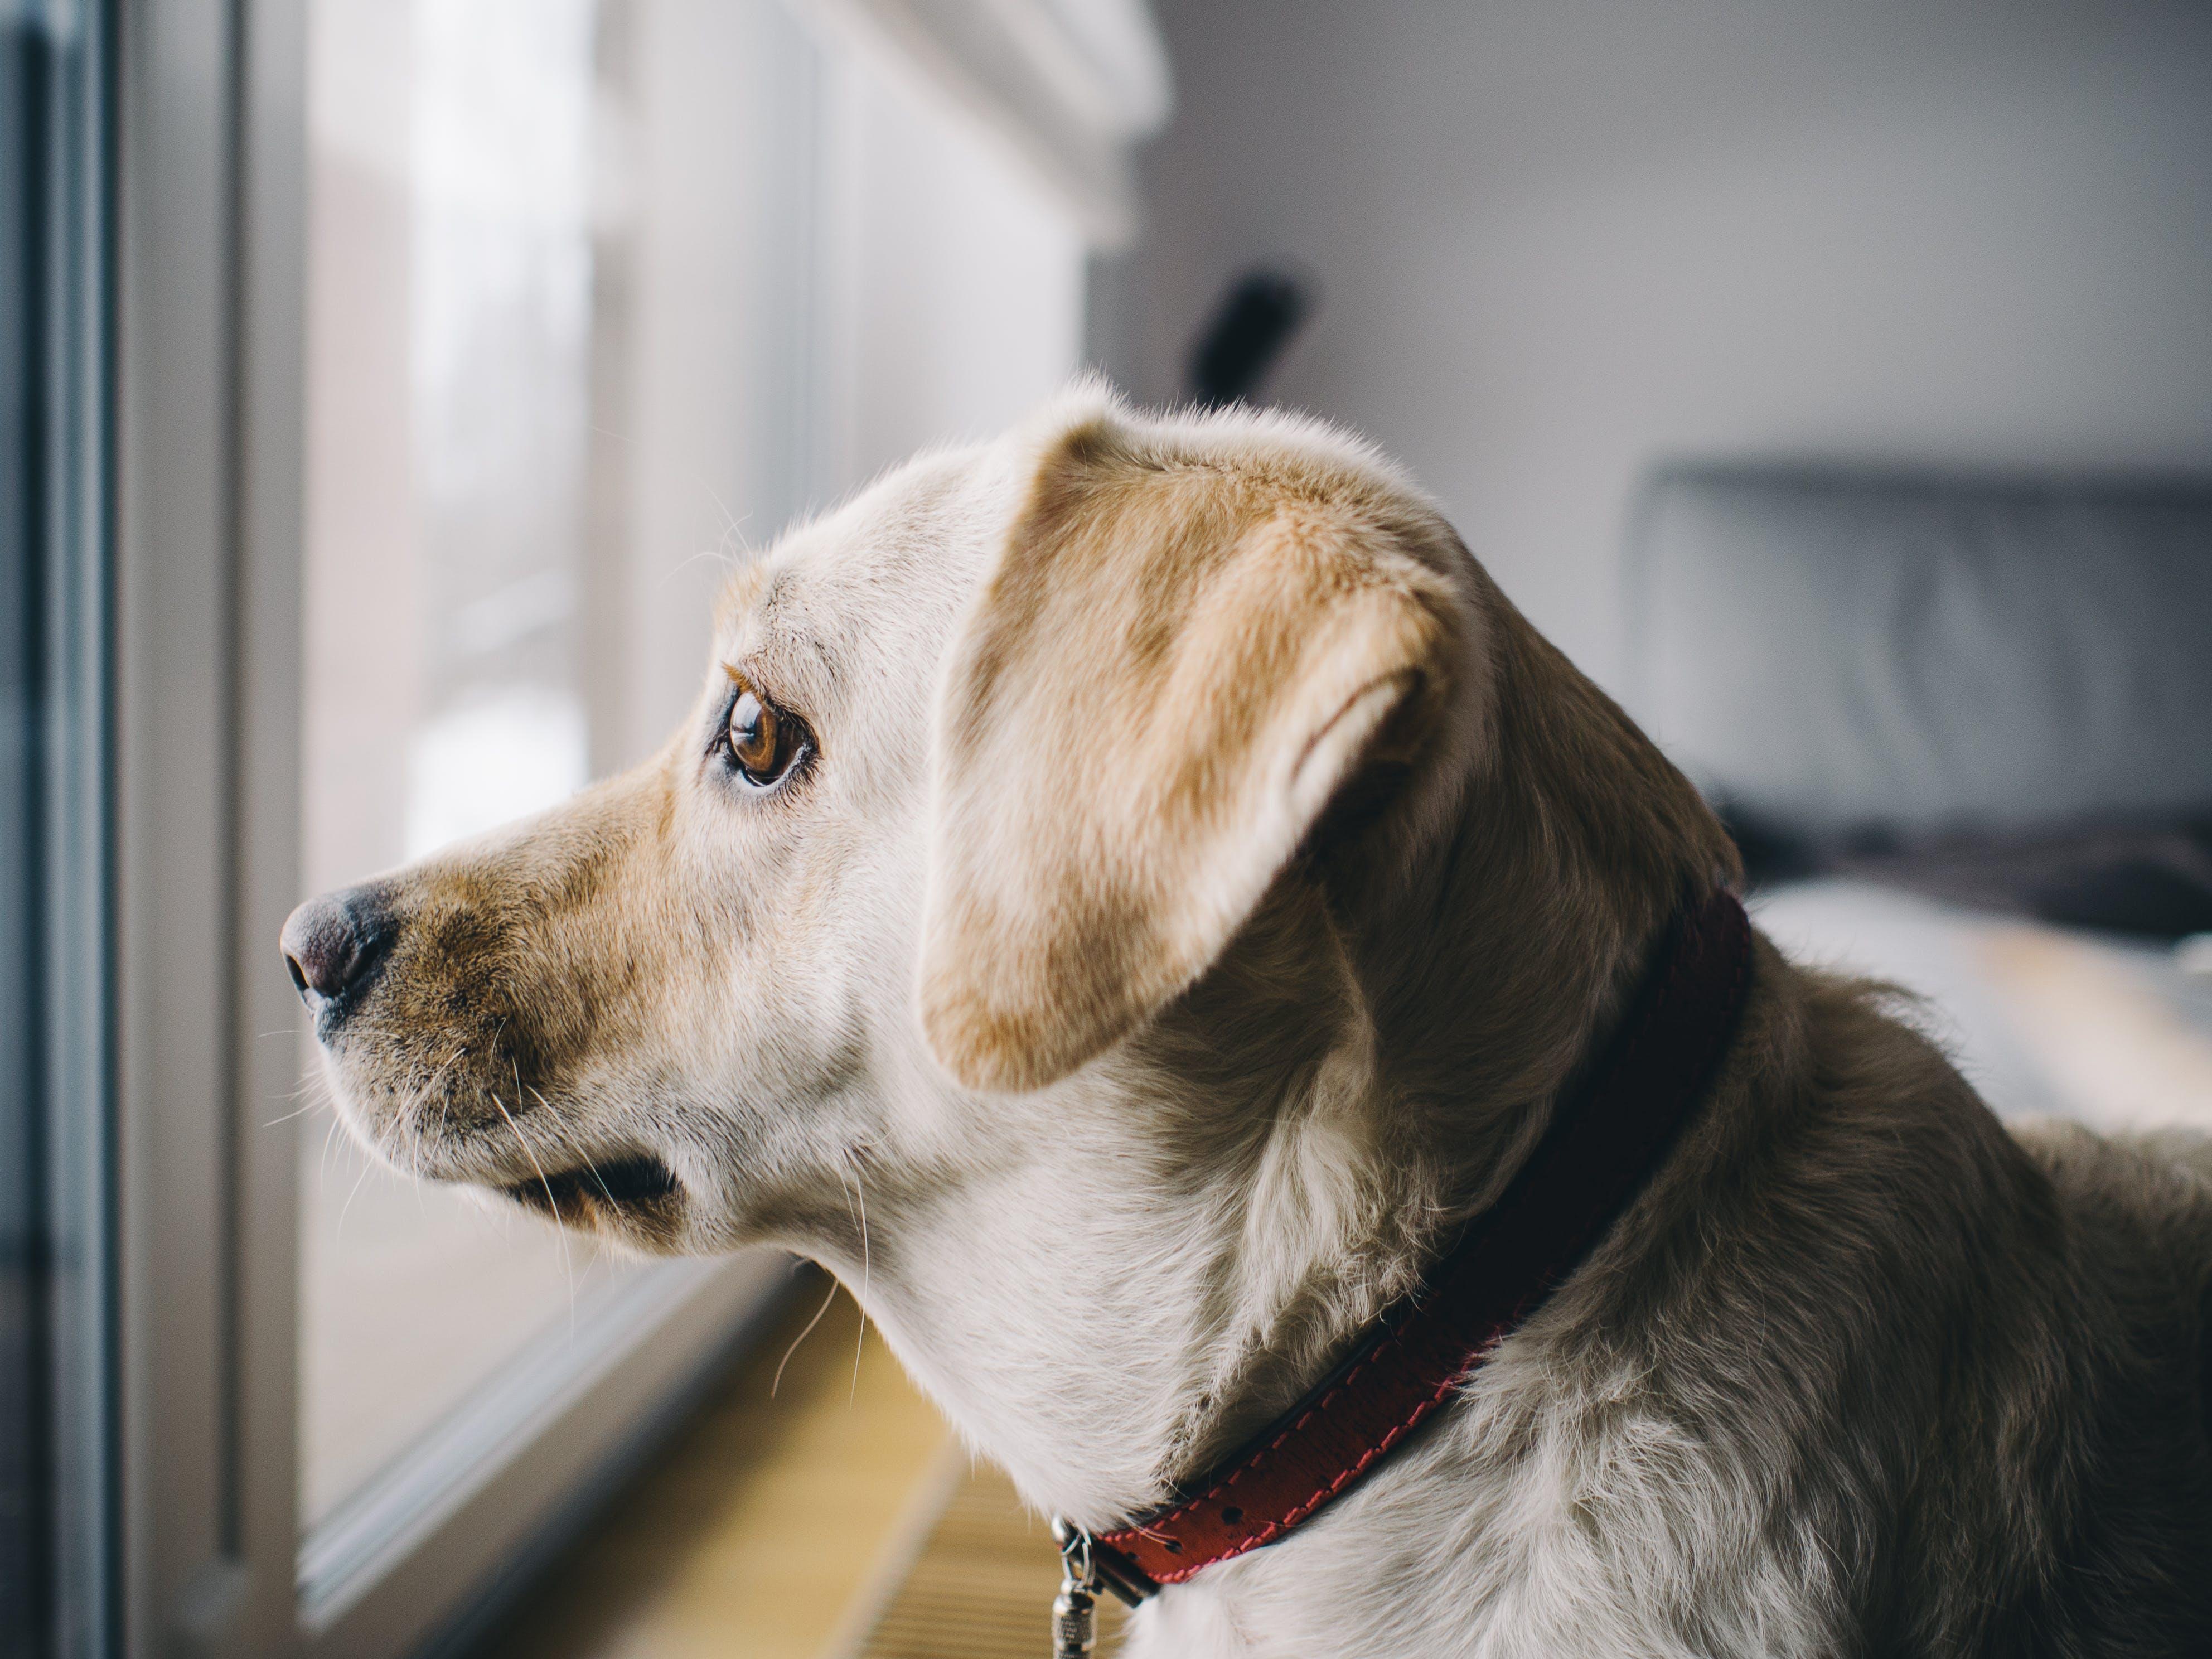 Yellow Labrador Retriever Facing Window in Room